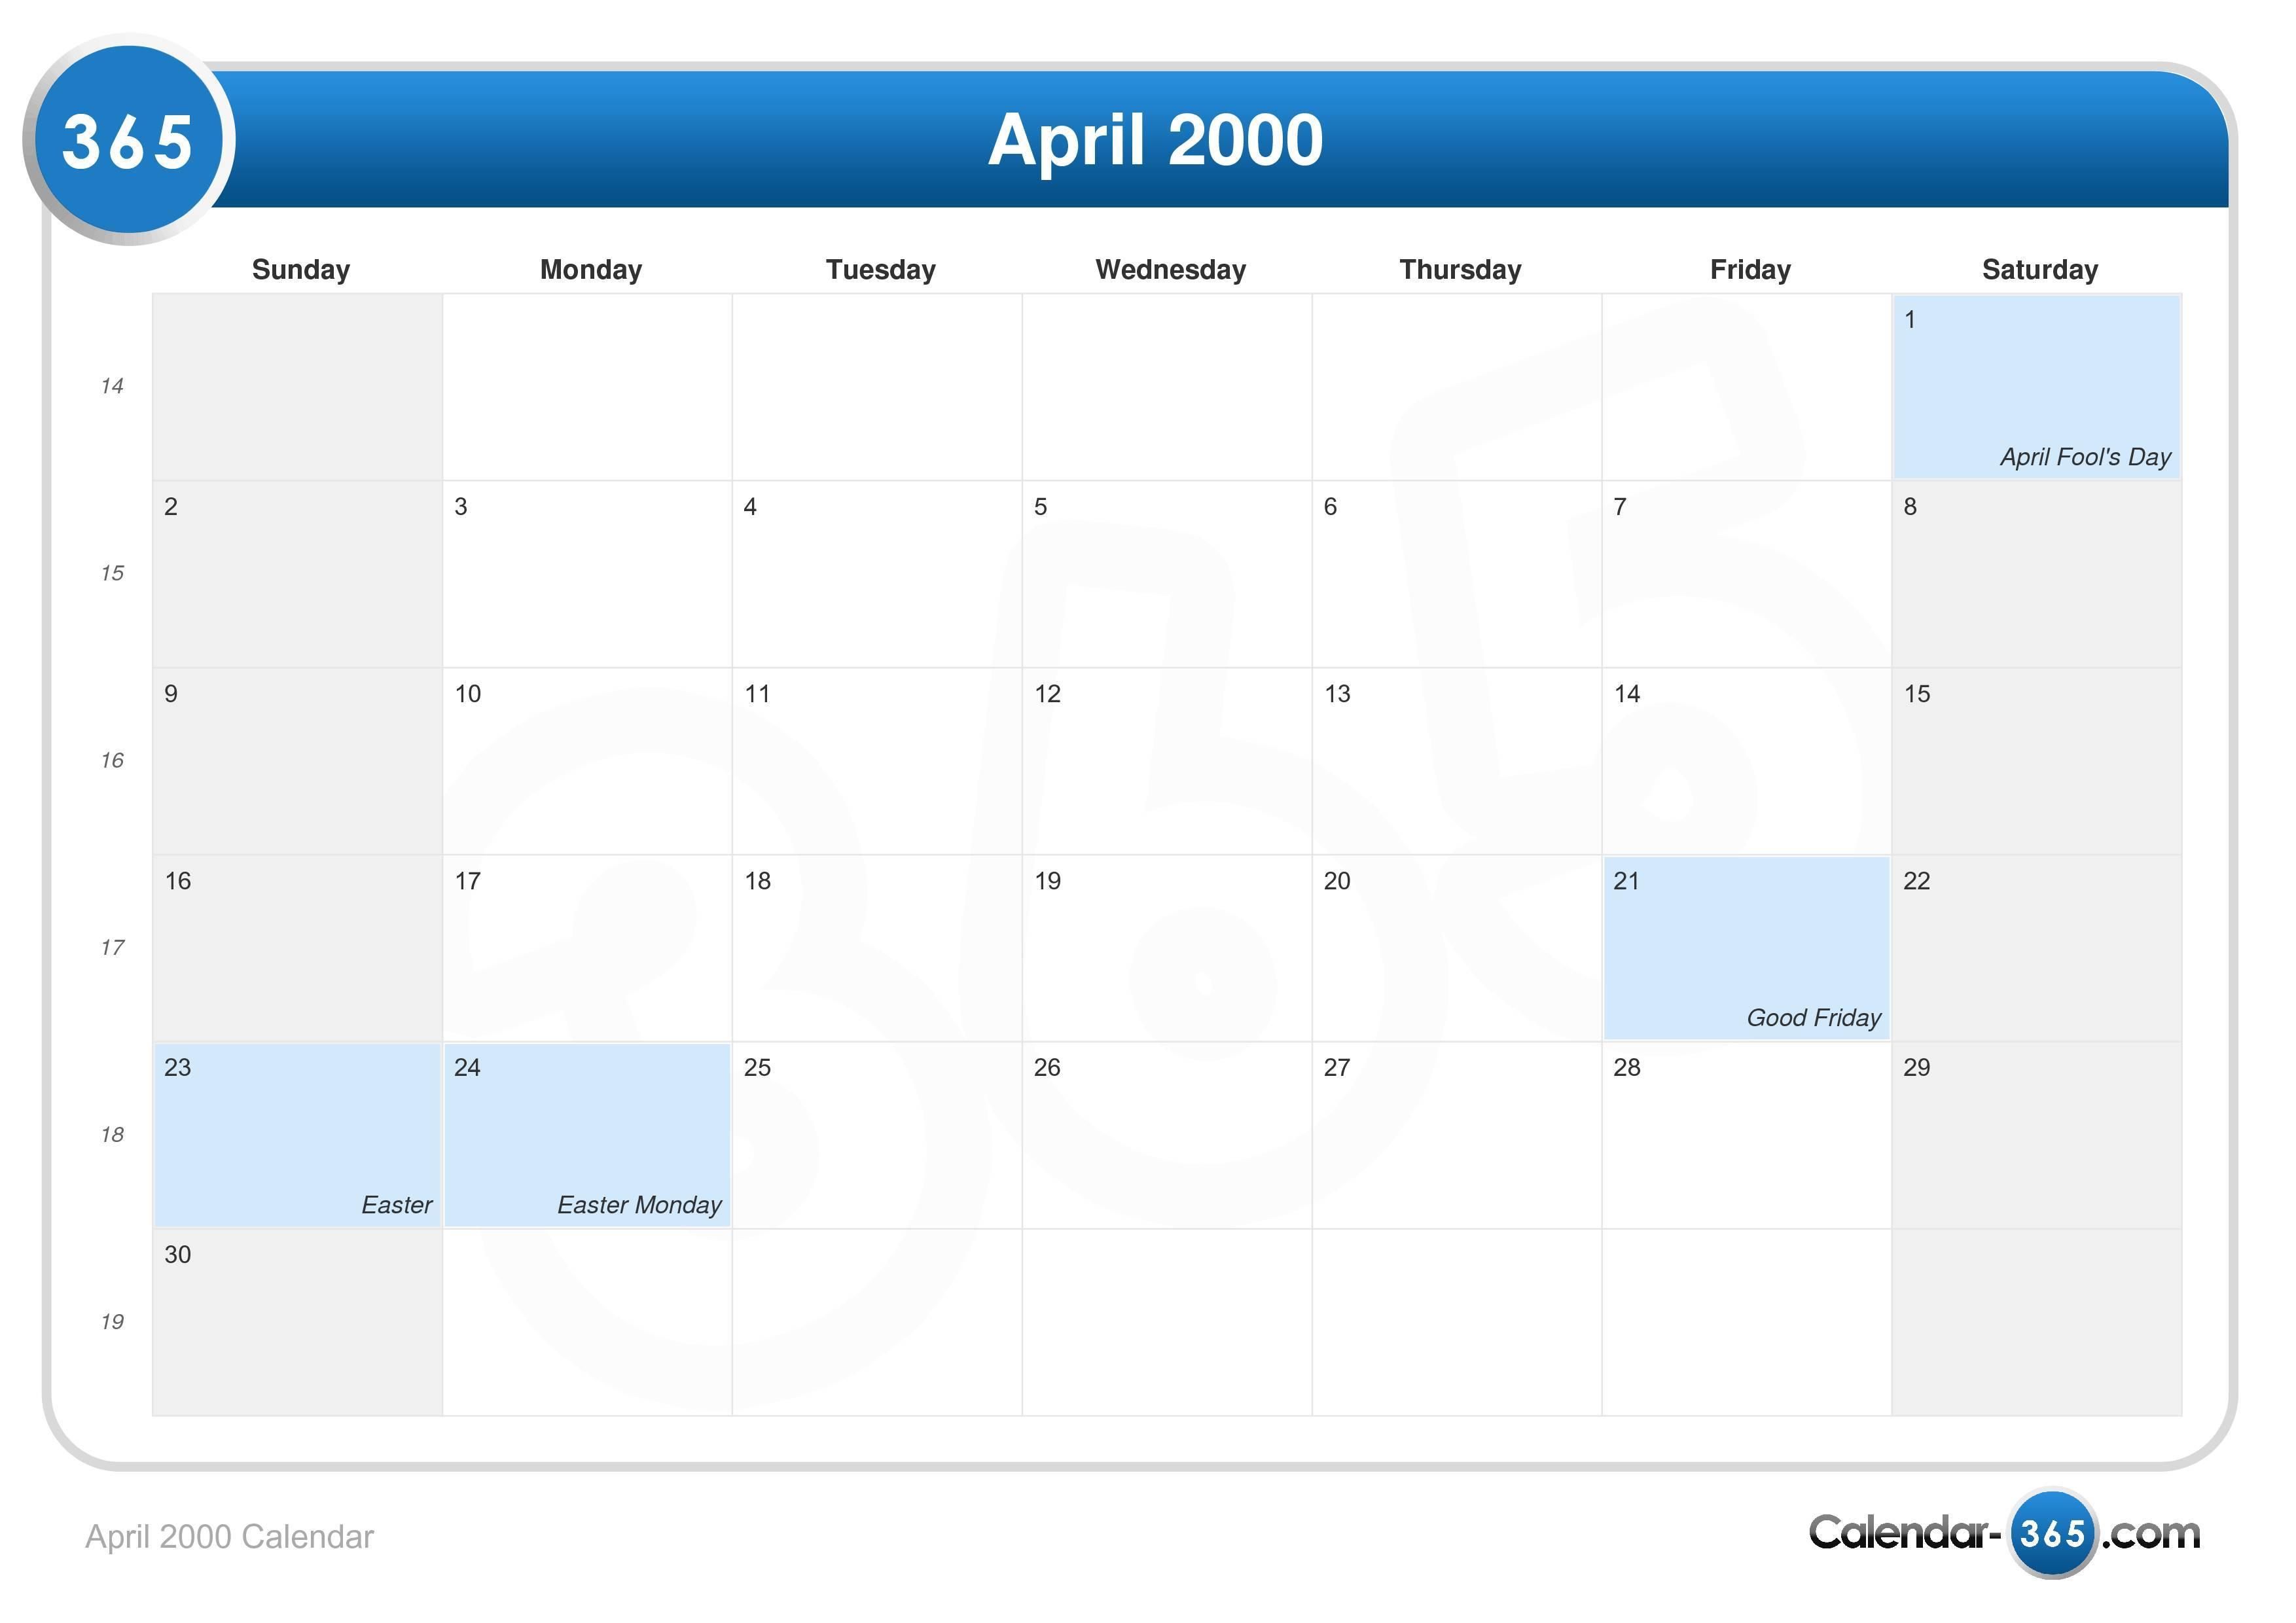 April 2000 Calendar